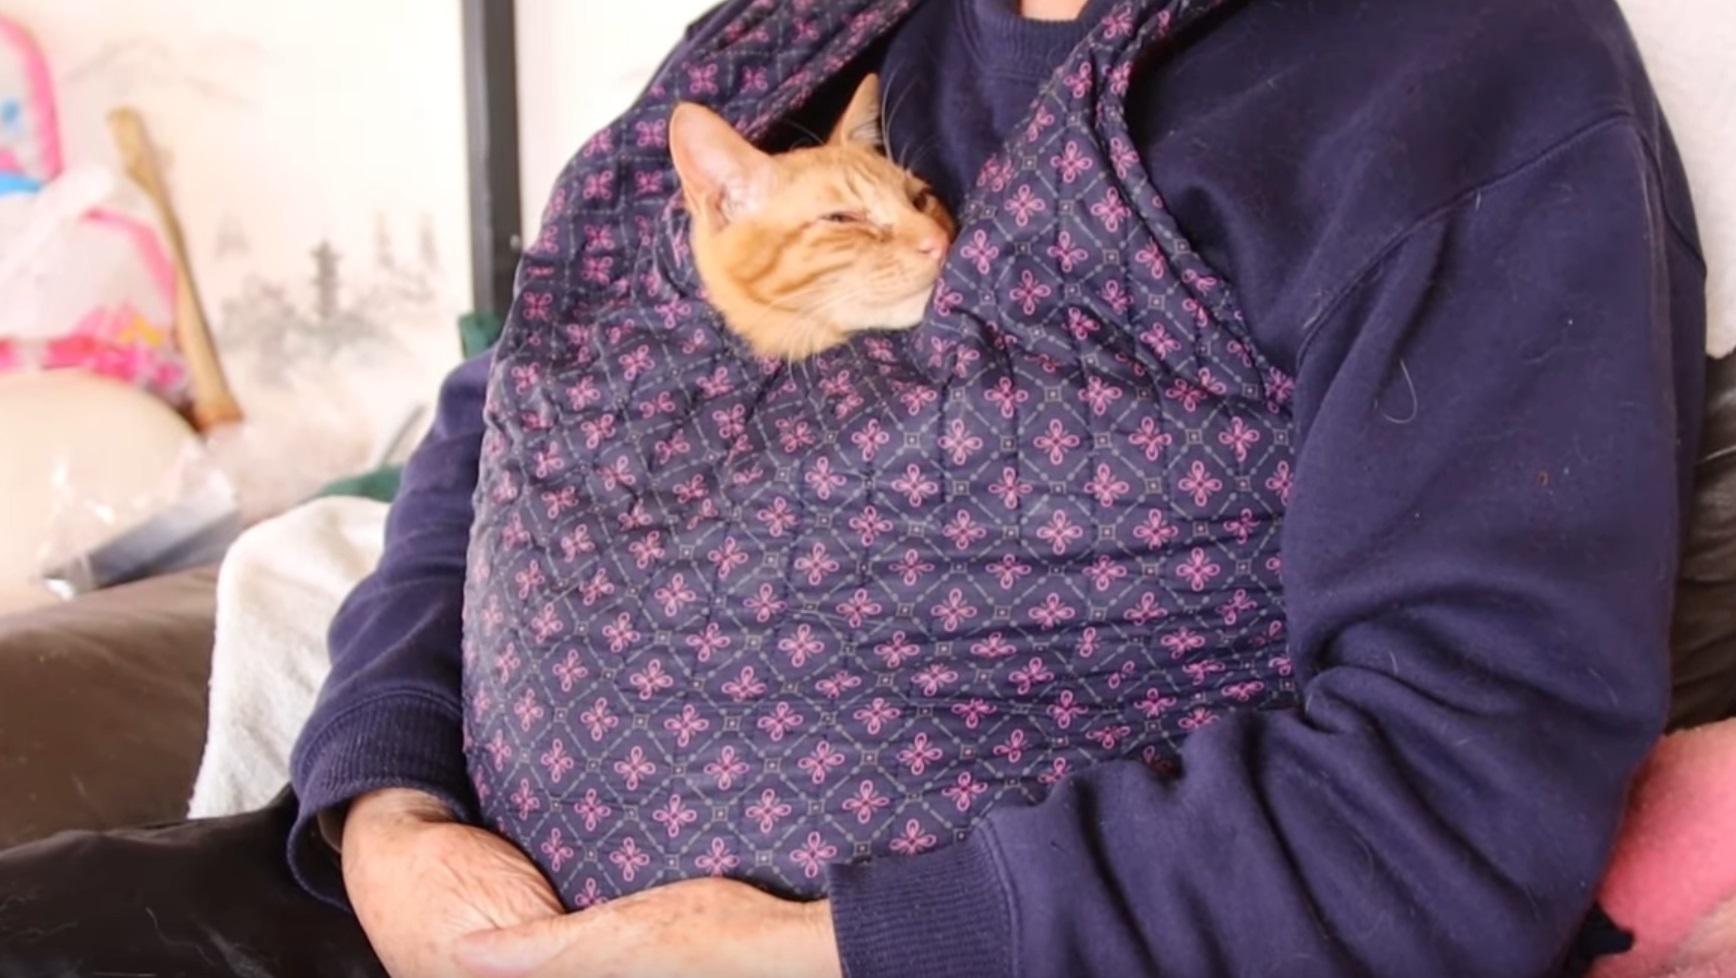 Snuggle With Grandma